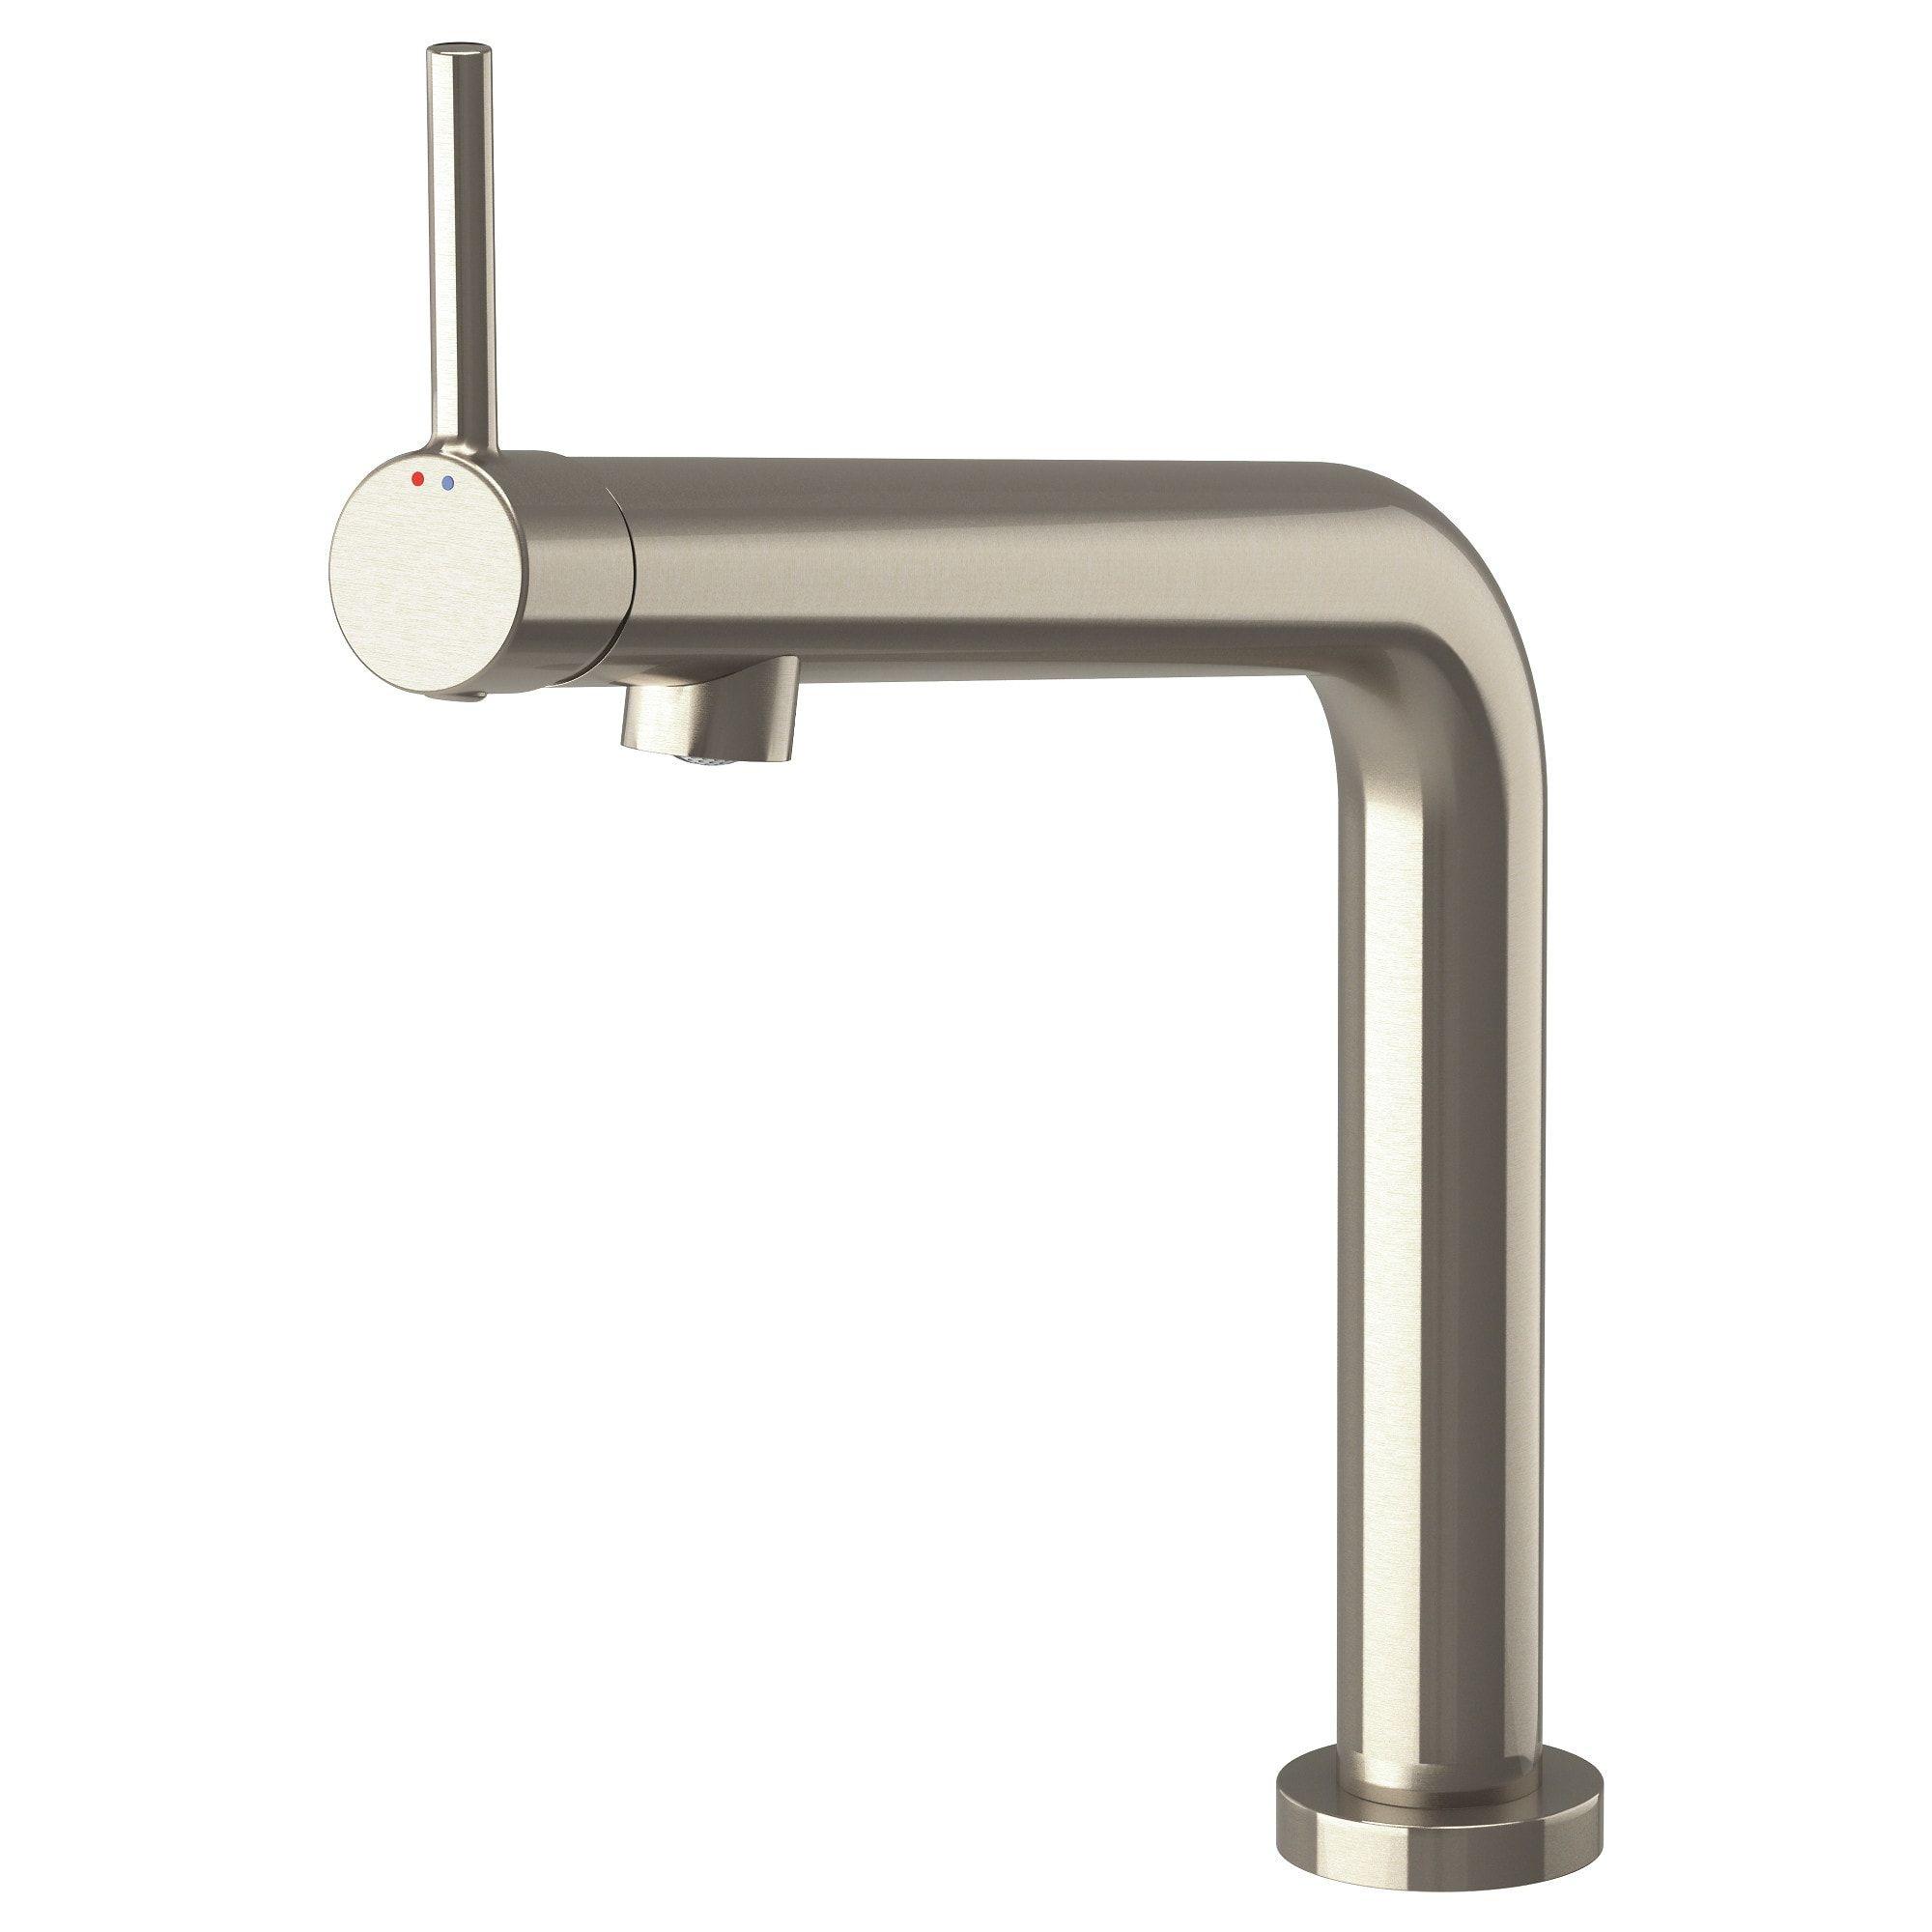 BOSJÖN Kitchen faucet - stainless steel color | * Kitchen ...